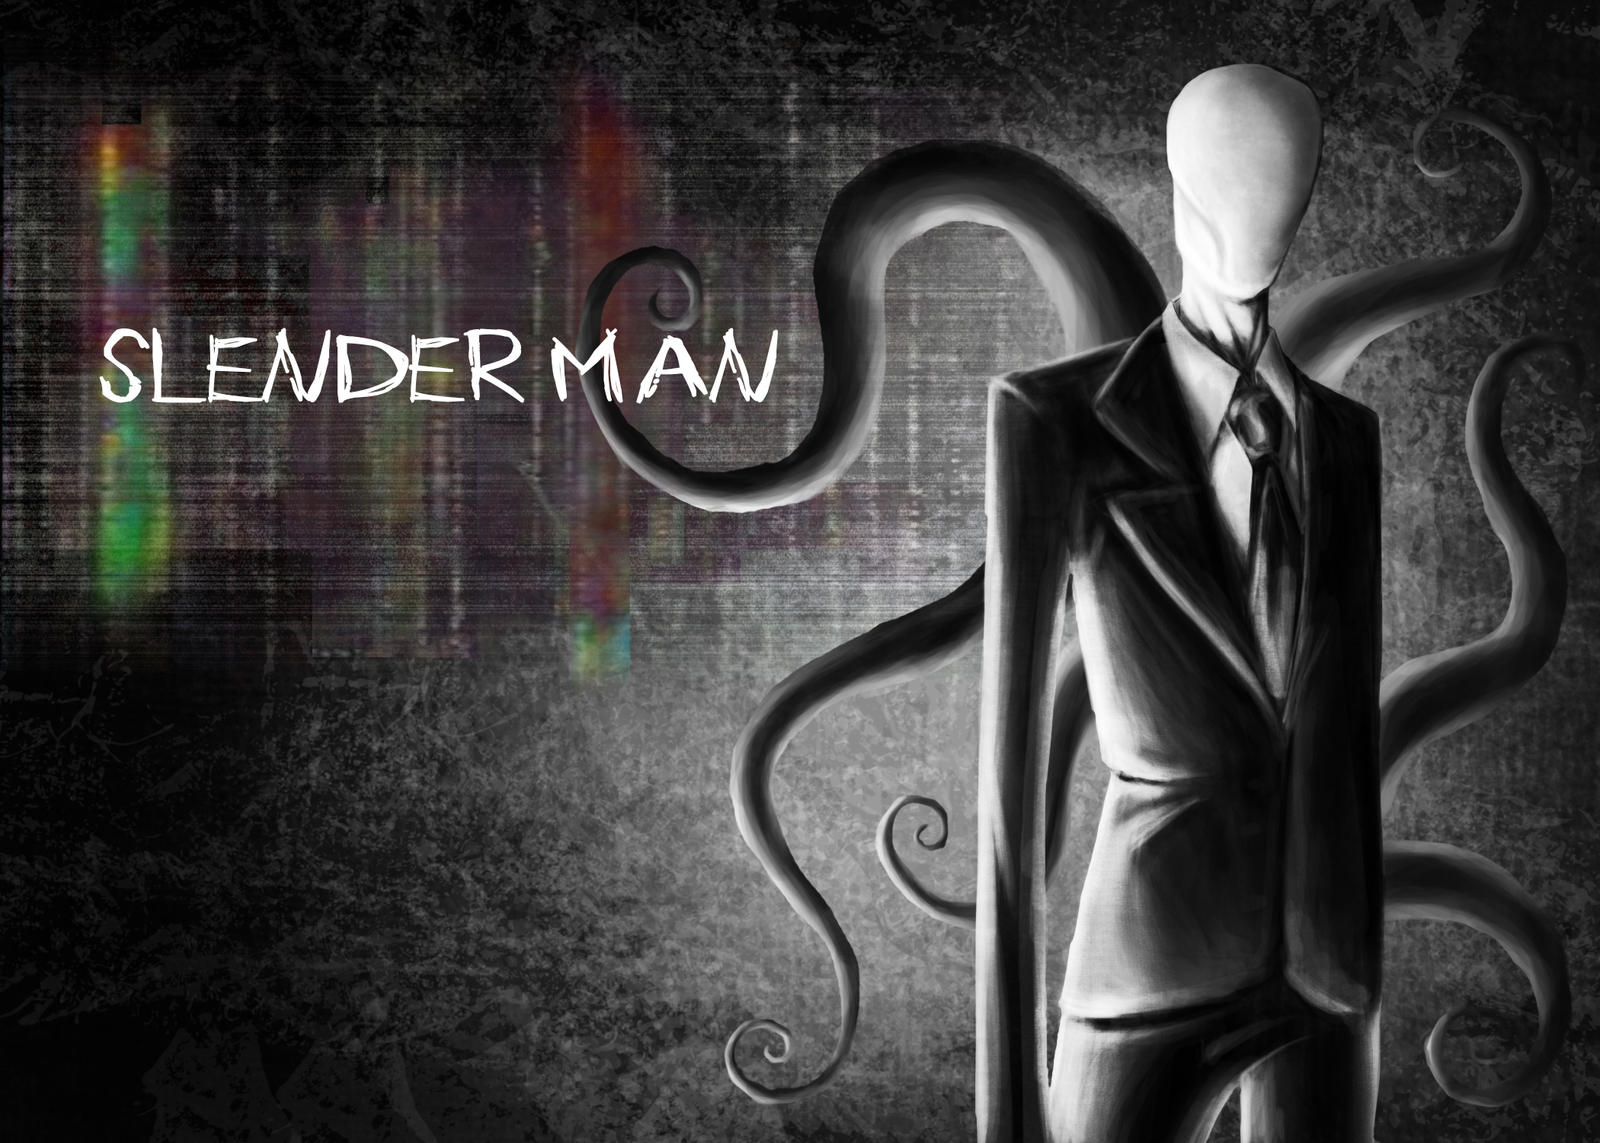 slender man wallpaper 1 - photo #3